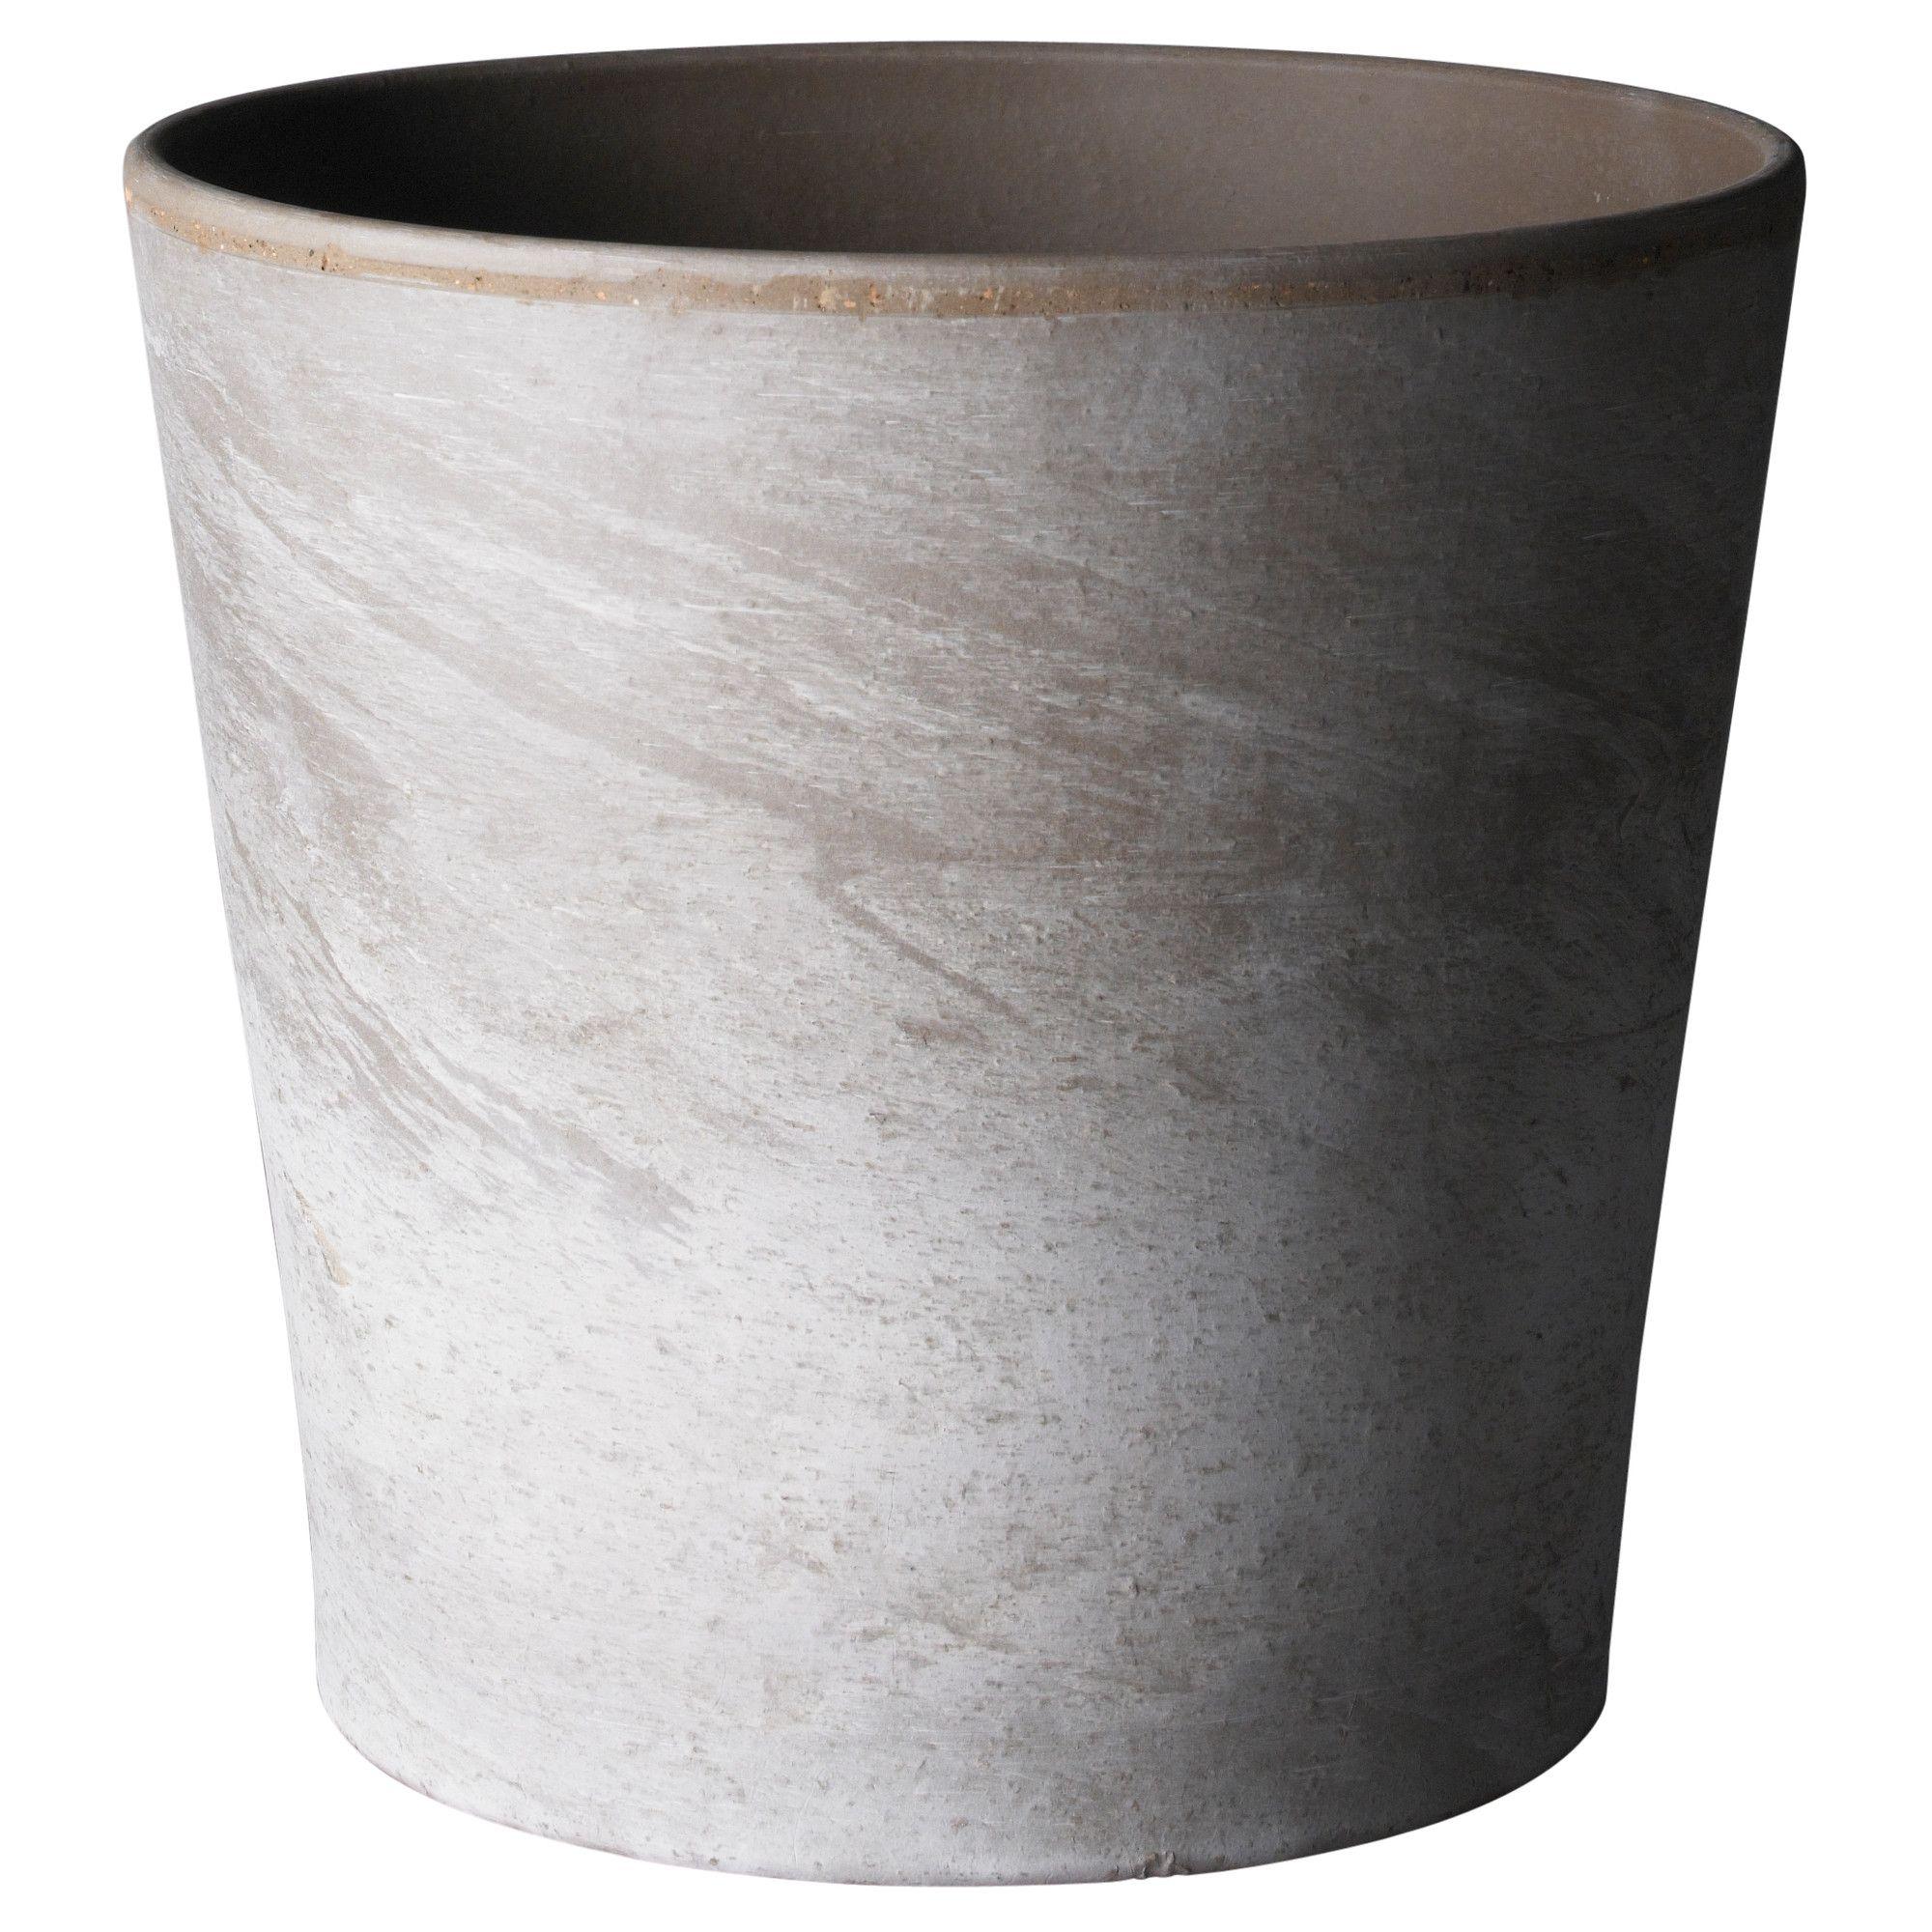 Ikea Australia Affordable Swedish Home Furniture Planter Pots Indoor Rustic Pots Potted Plants